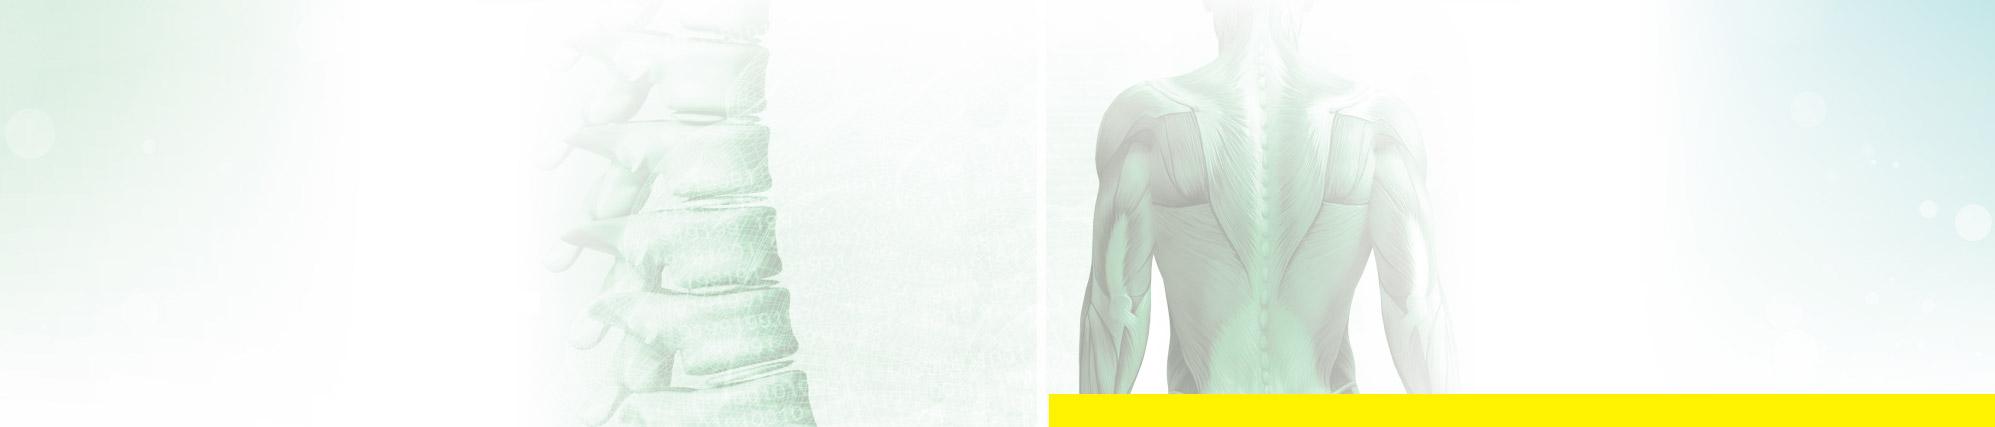 banner-main-fizjoterapia-rzeszow-bg2